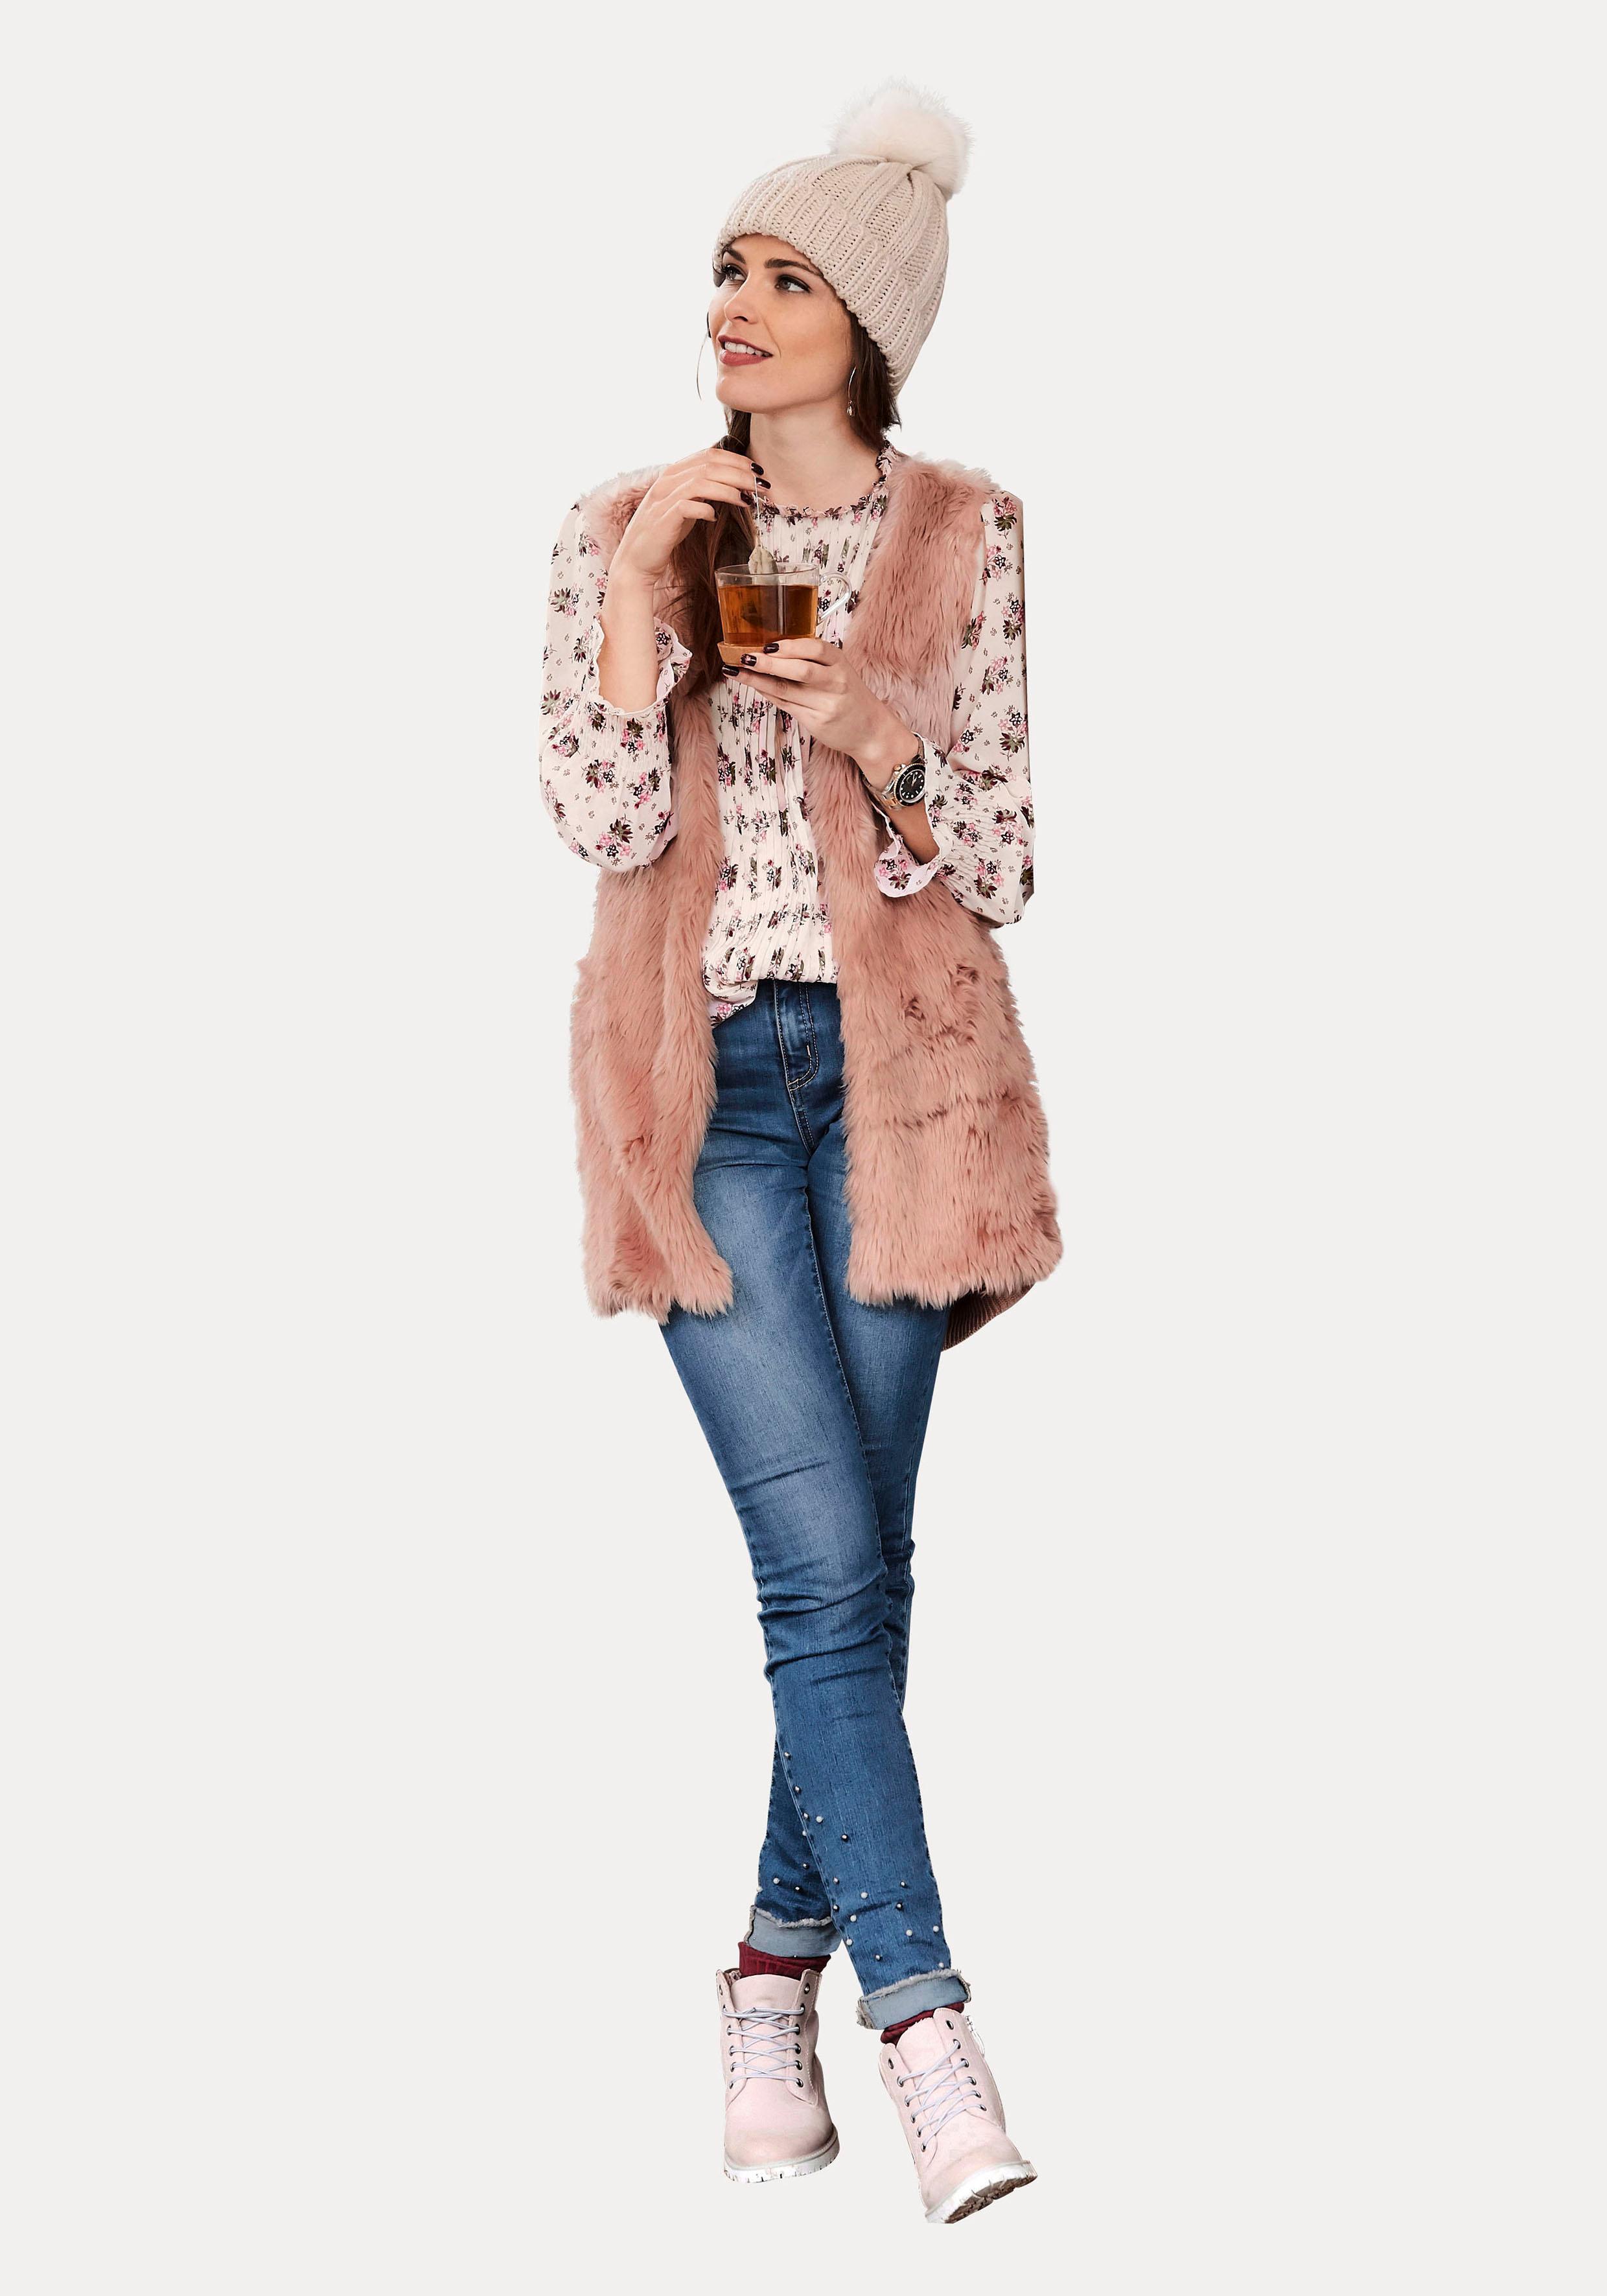 120 Komplette Outfits Fur Damen Outfit Trends 2019 Bei Baur